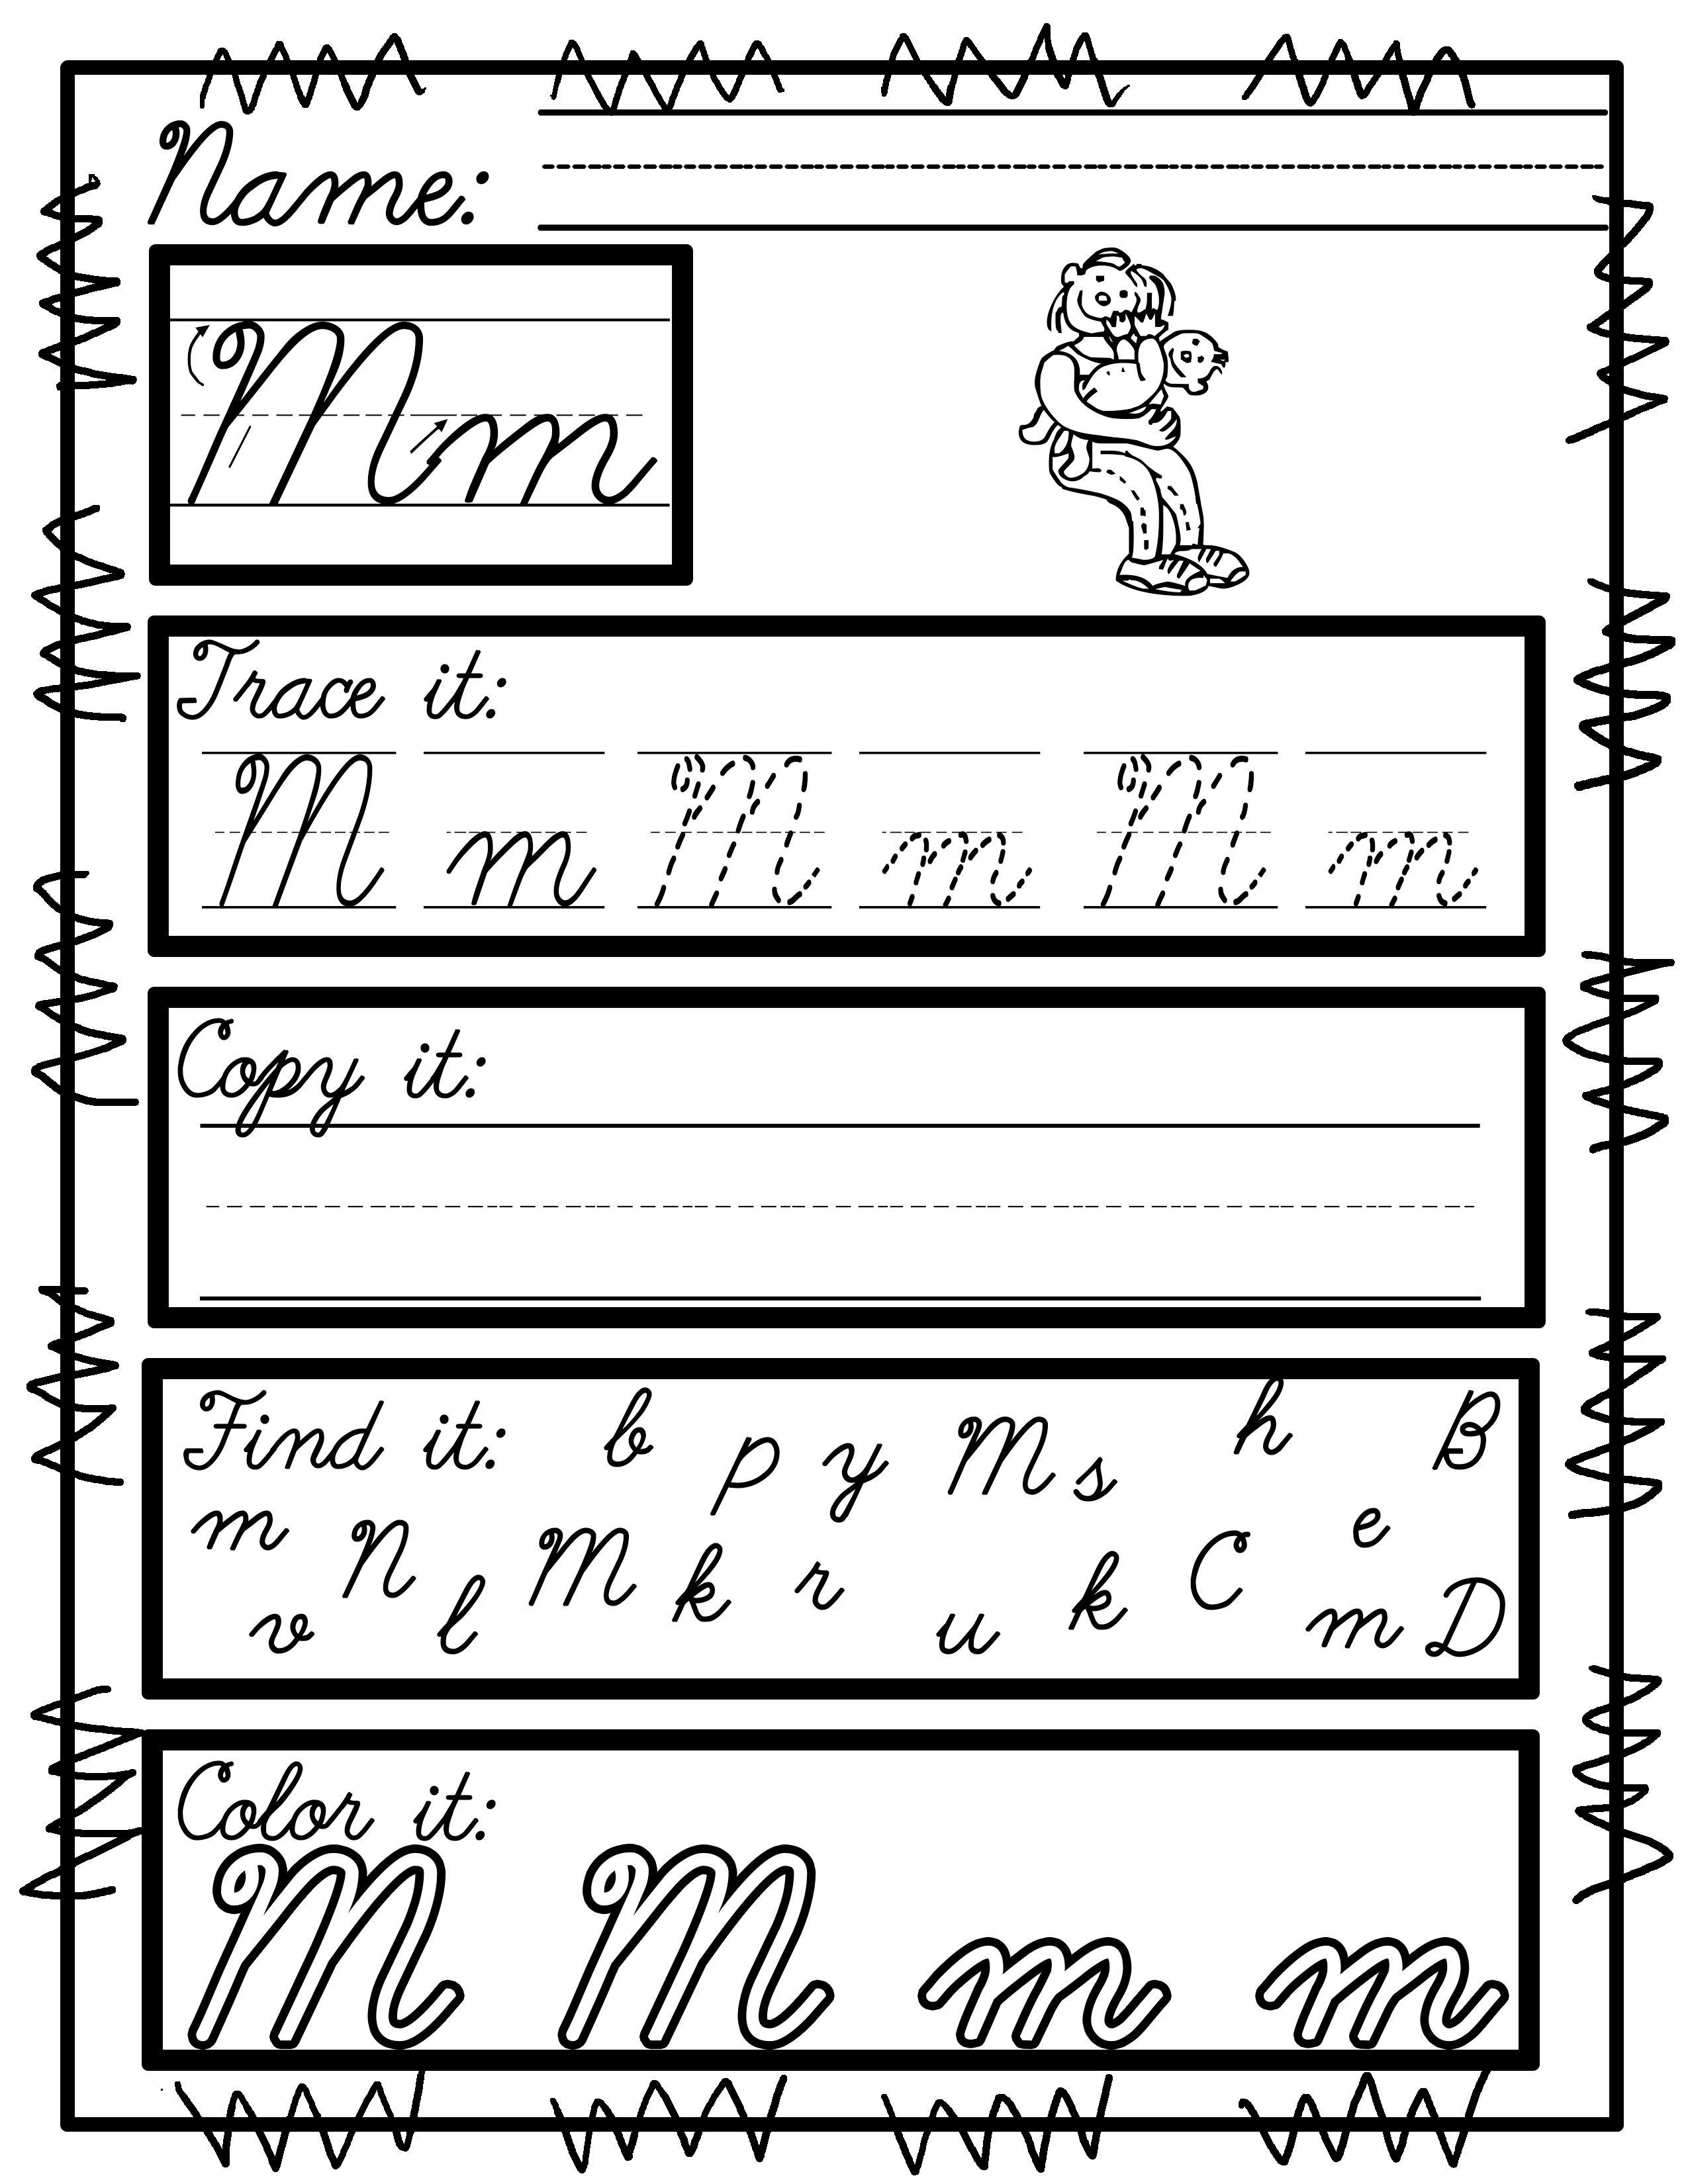 Worksheets For Cursive Handwriting Practice